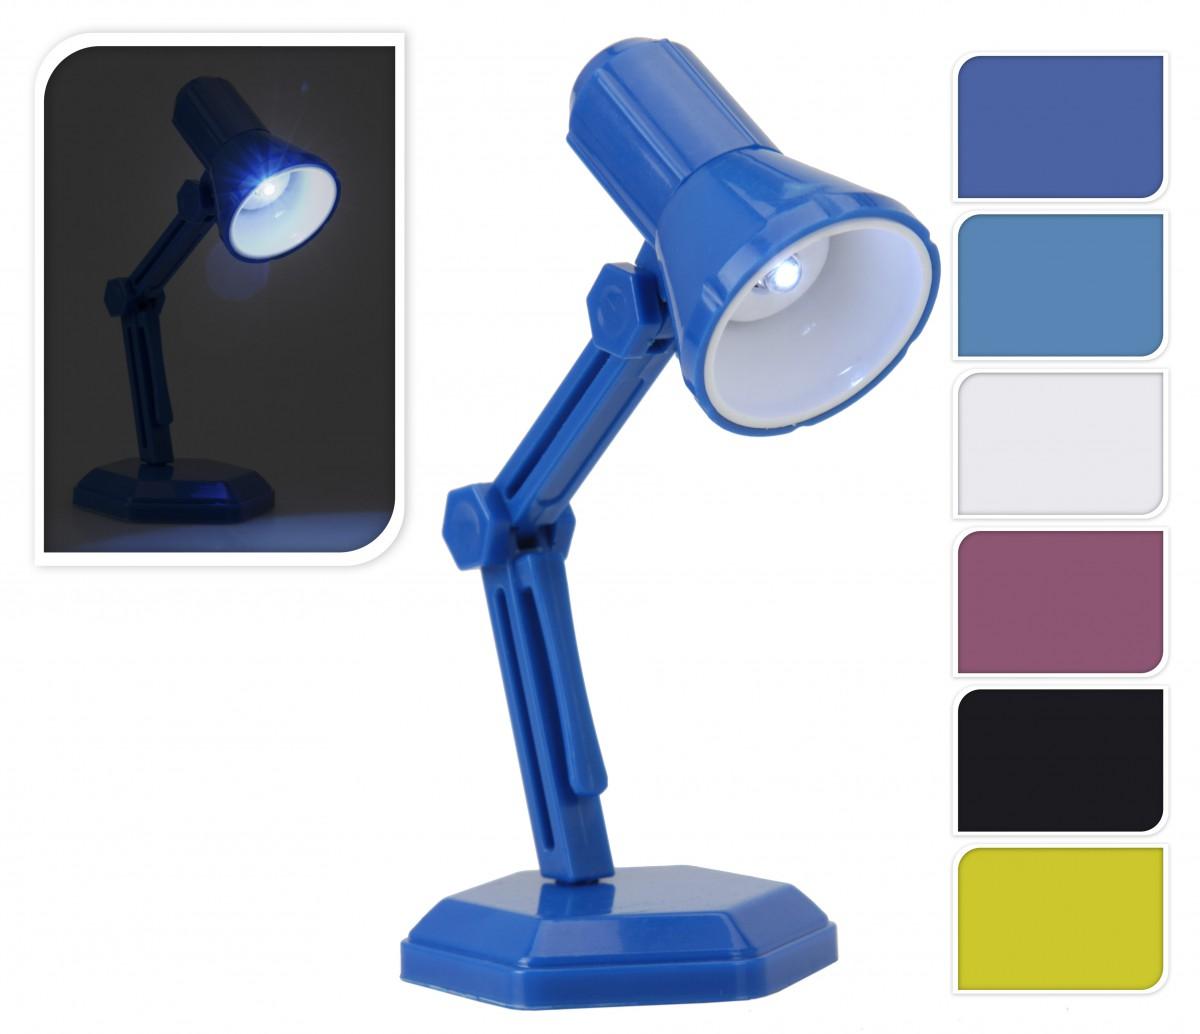 leselampe h 12cm wohnen wohnaccessoires lampen lampen. Black Bedroom Furniture Sets. Home Design Ideas